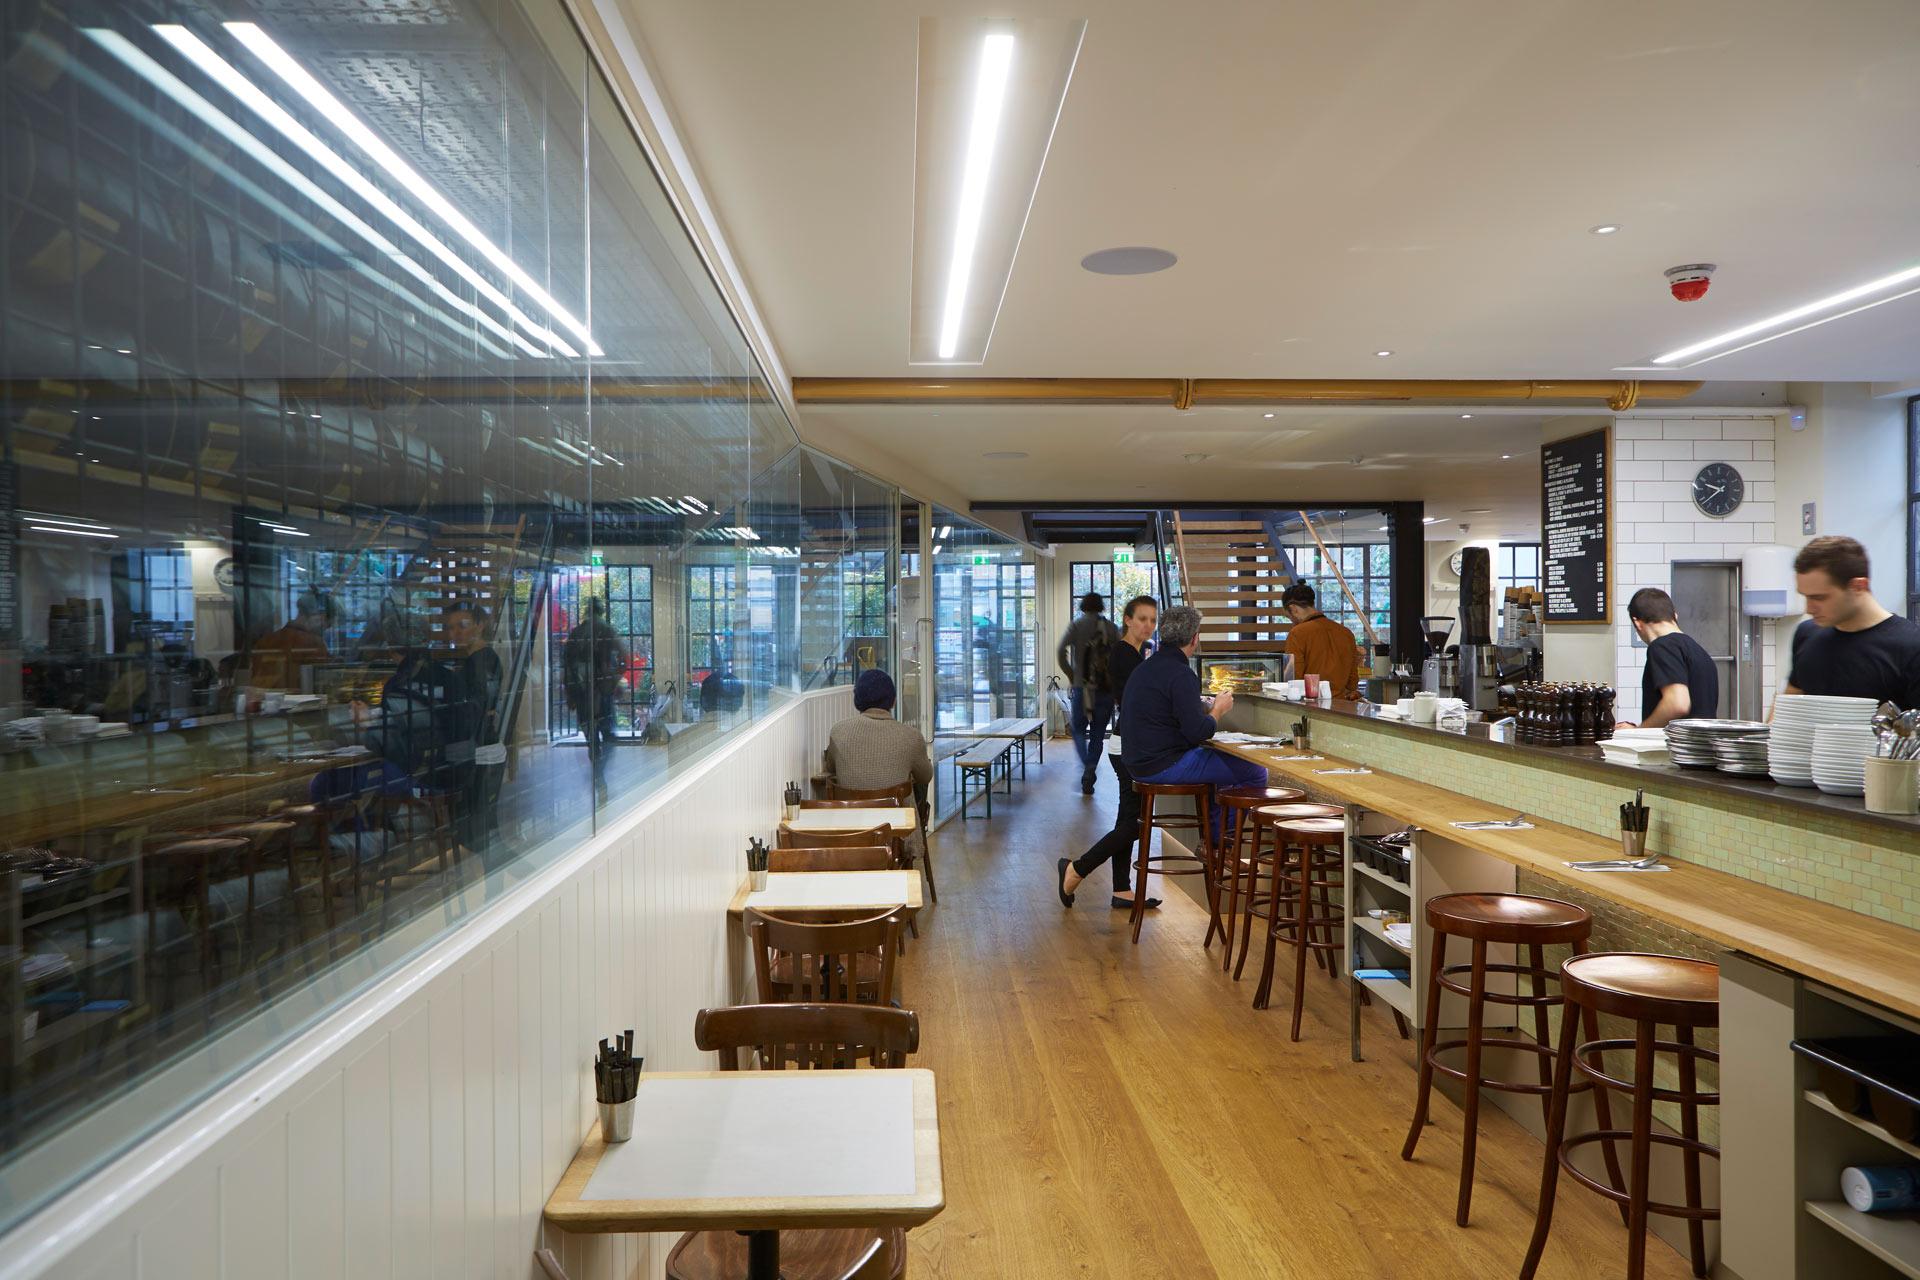 Allpress Cafe office & training Center | London, UK